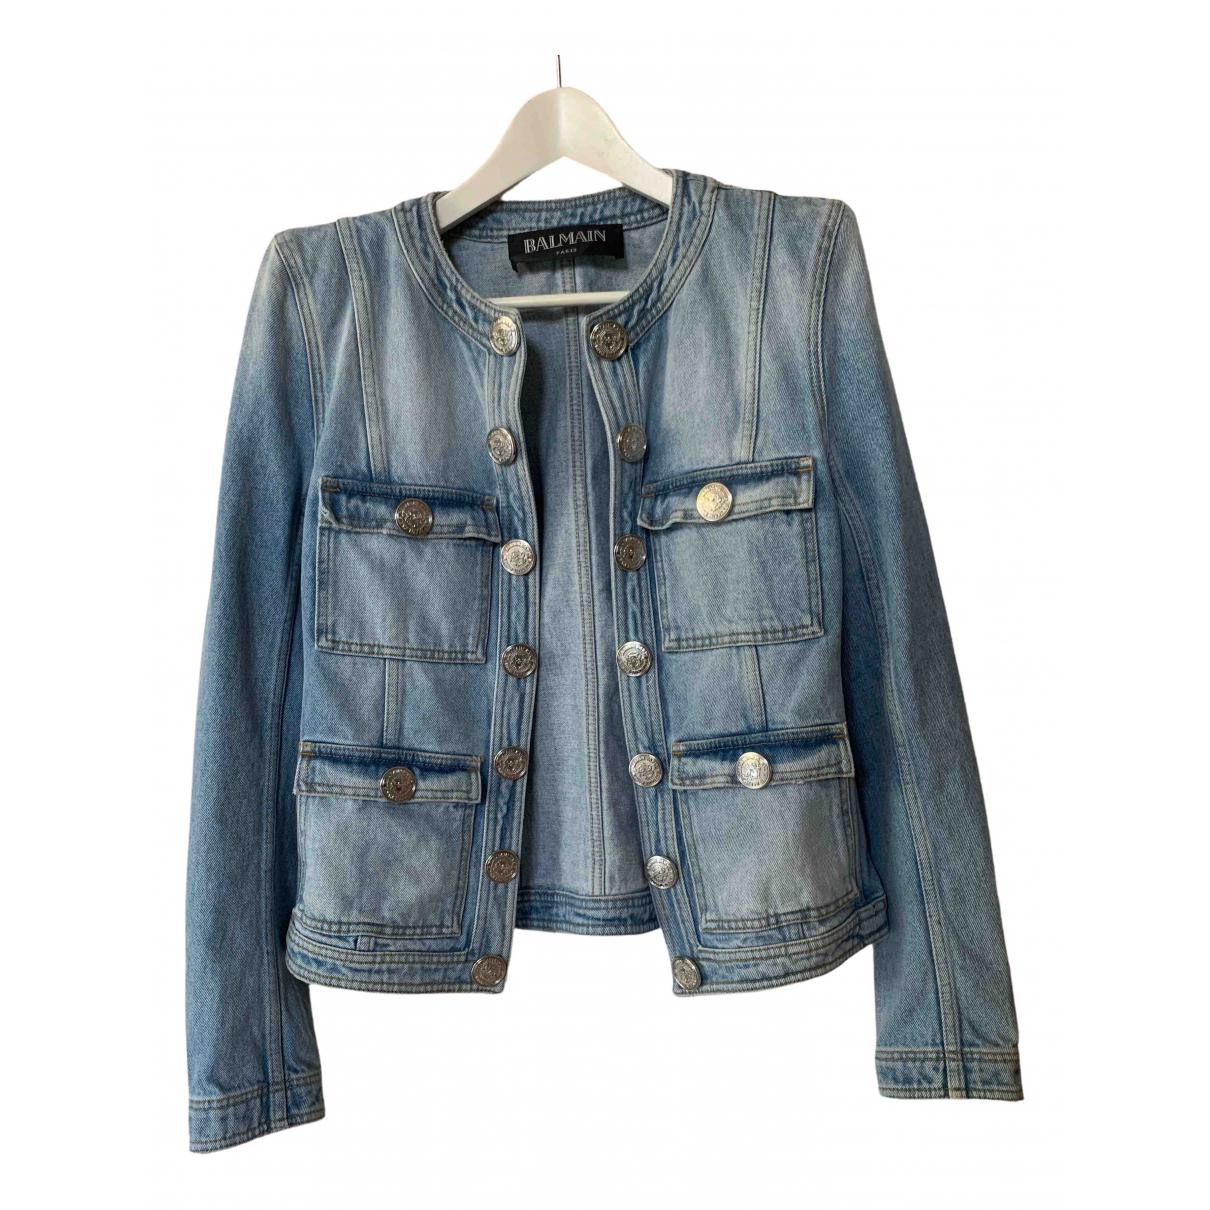 Balmain \N Blue Denim - Jeans jacket for Women 42 FR